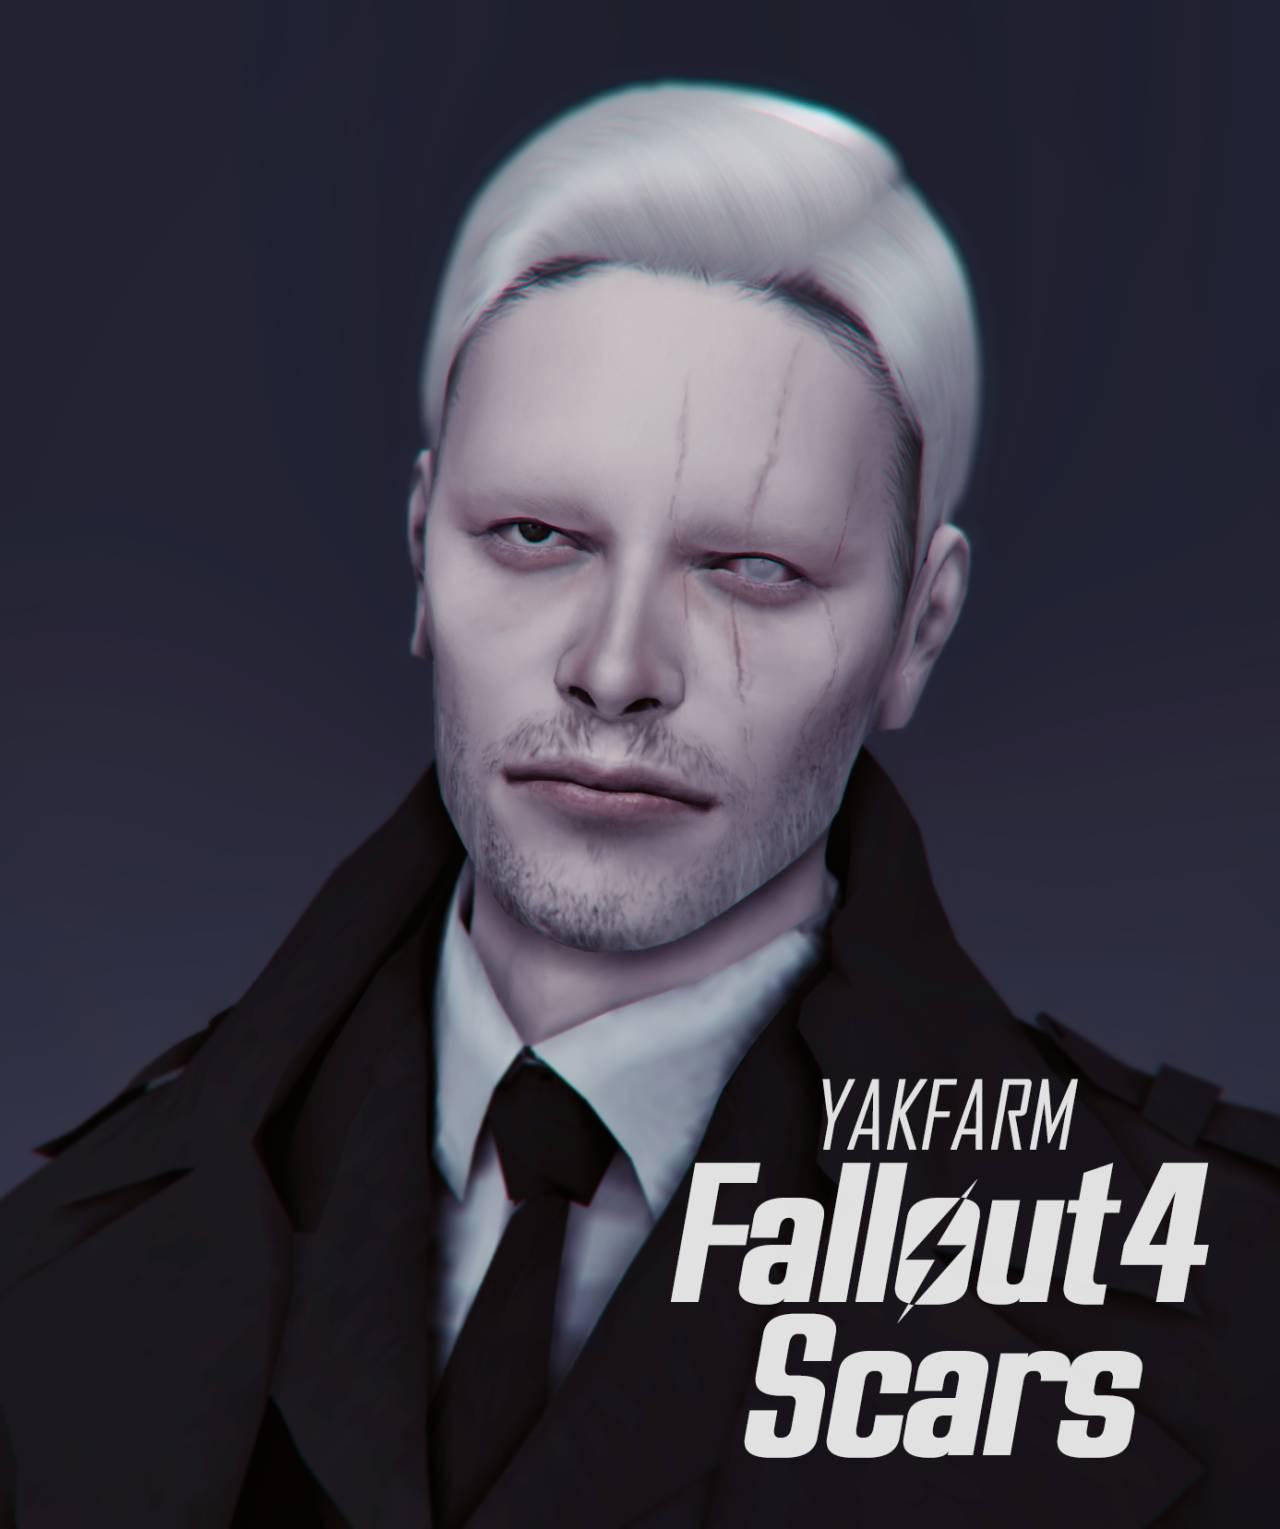 Набор шрамов - Fallout Face Scars